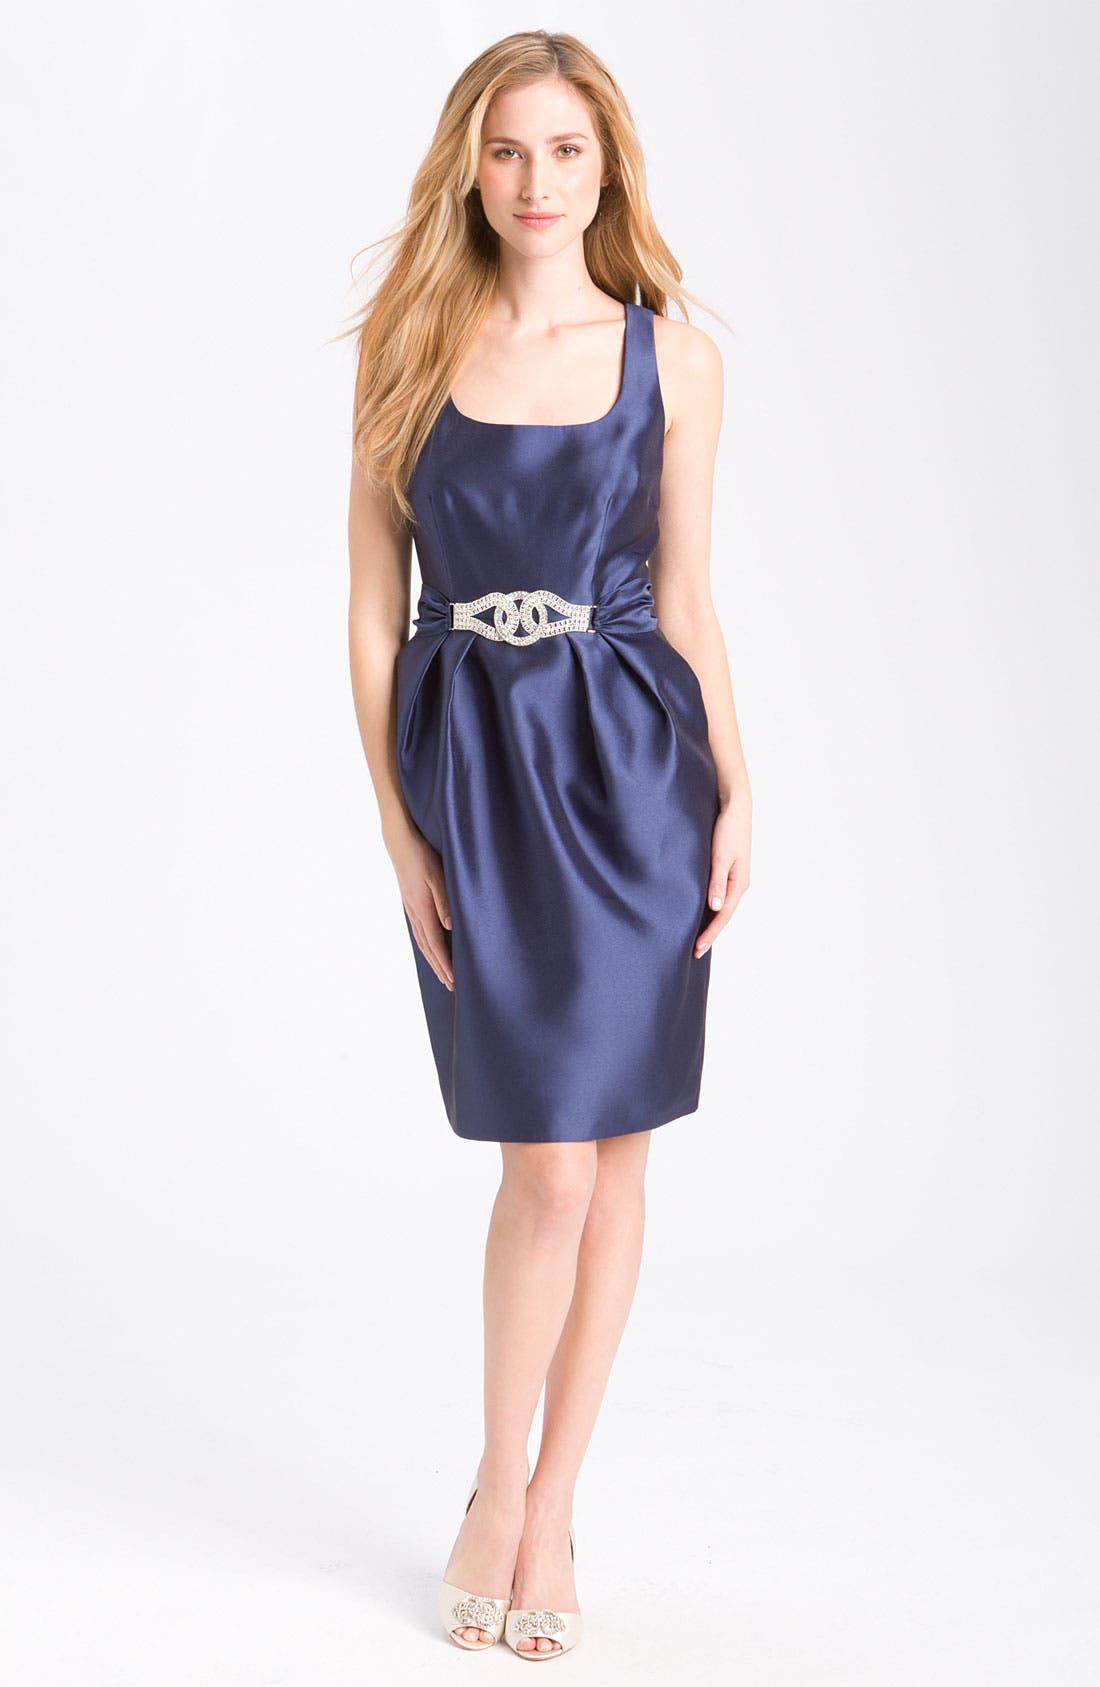 Alternate Image 1 Selected - Alex Evenings Embellished Satin Sheath Dress (Petite)